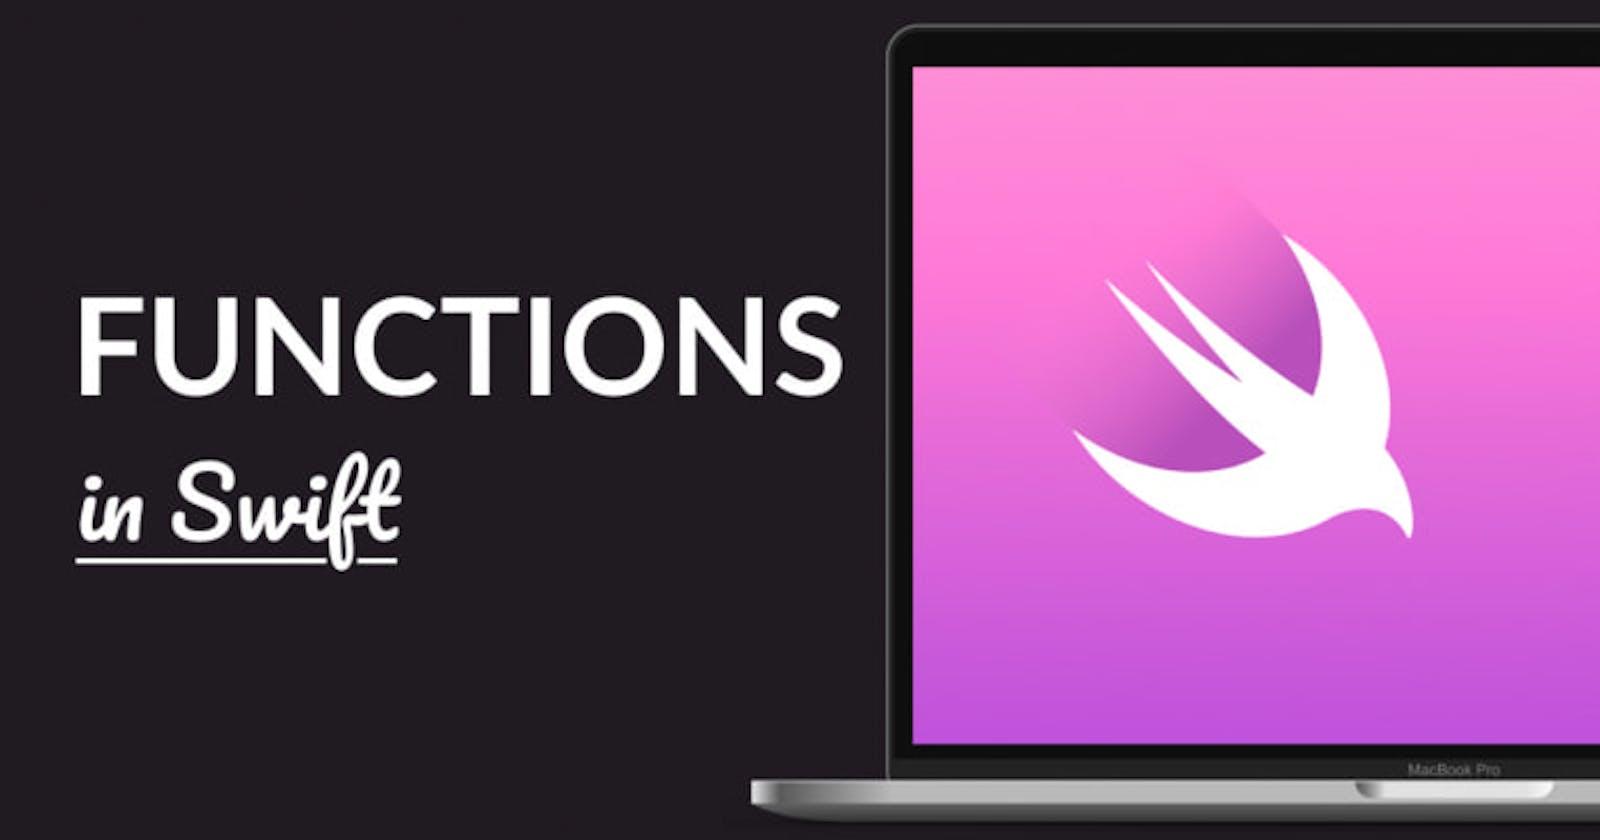 Functions in Swift